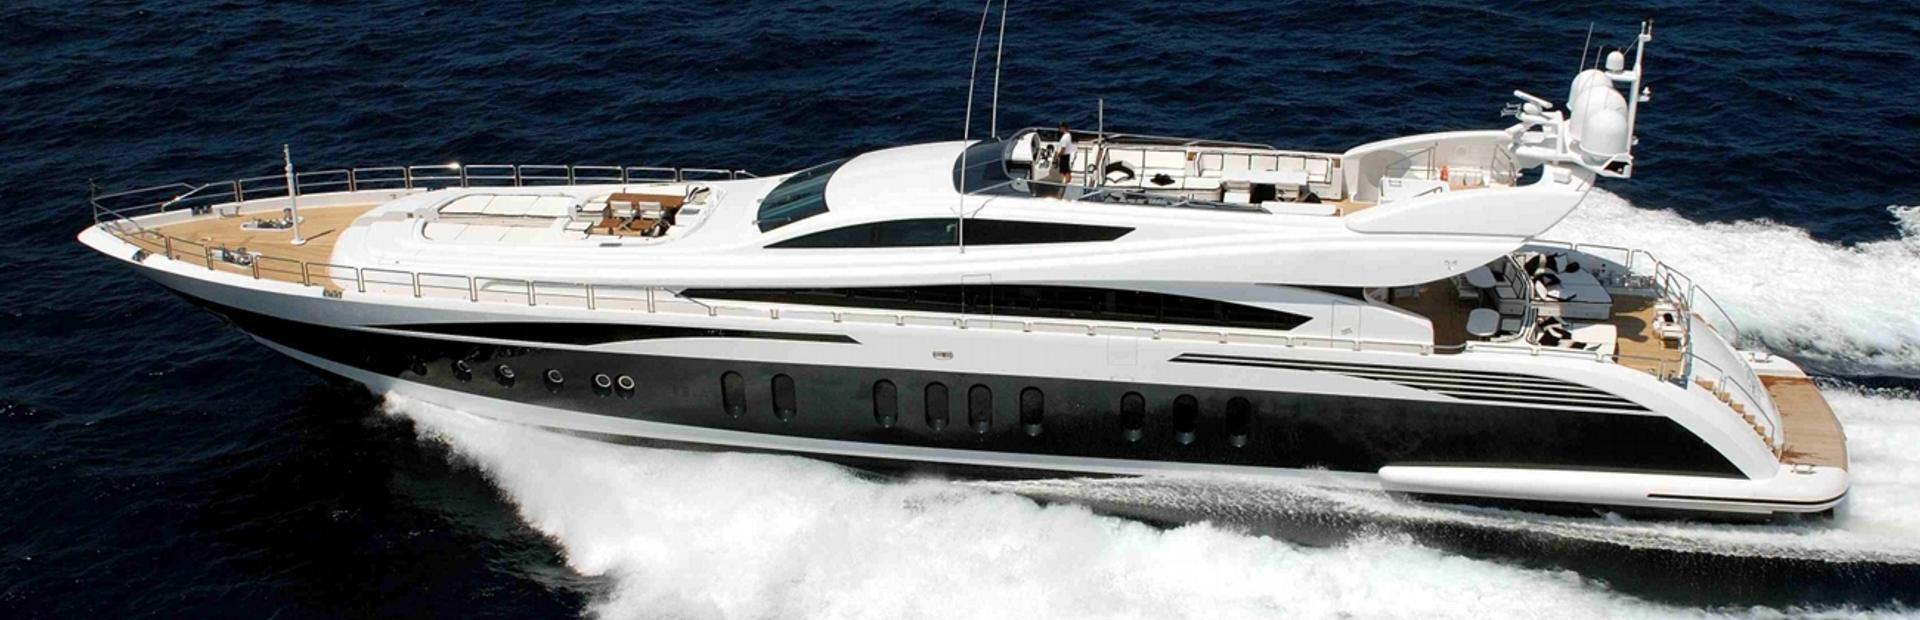 Leopard 46 Yacht Charter